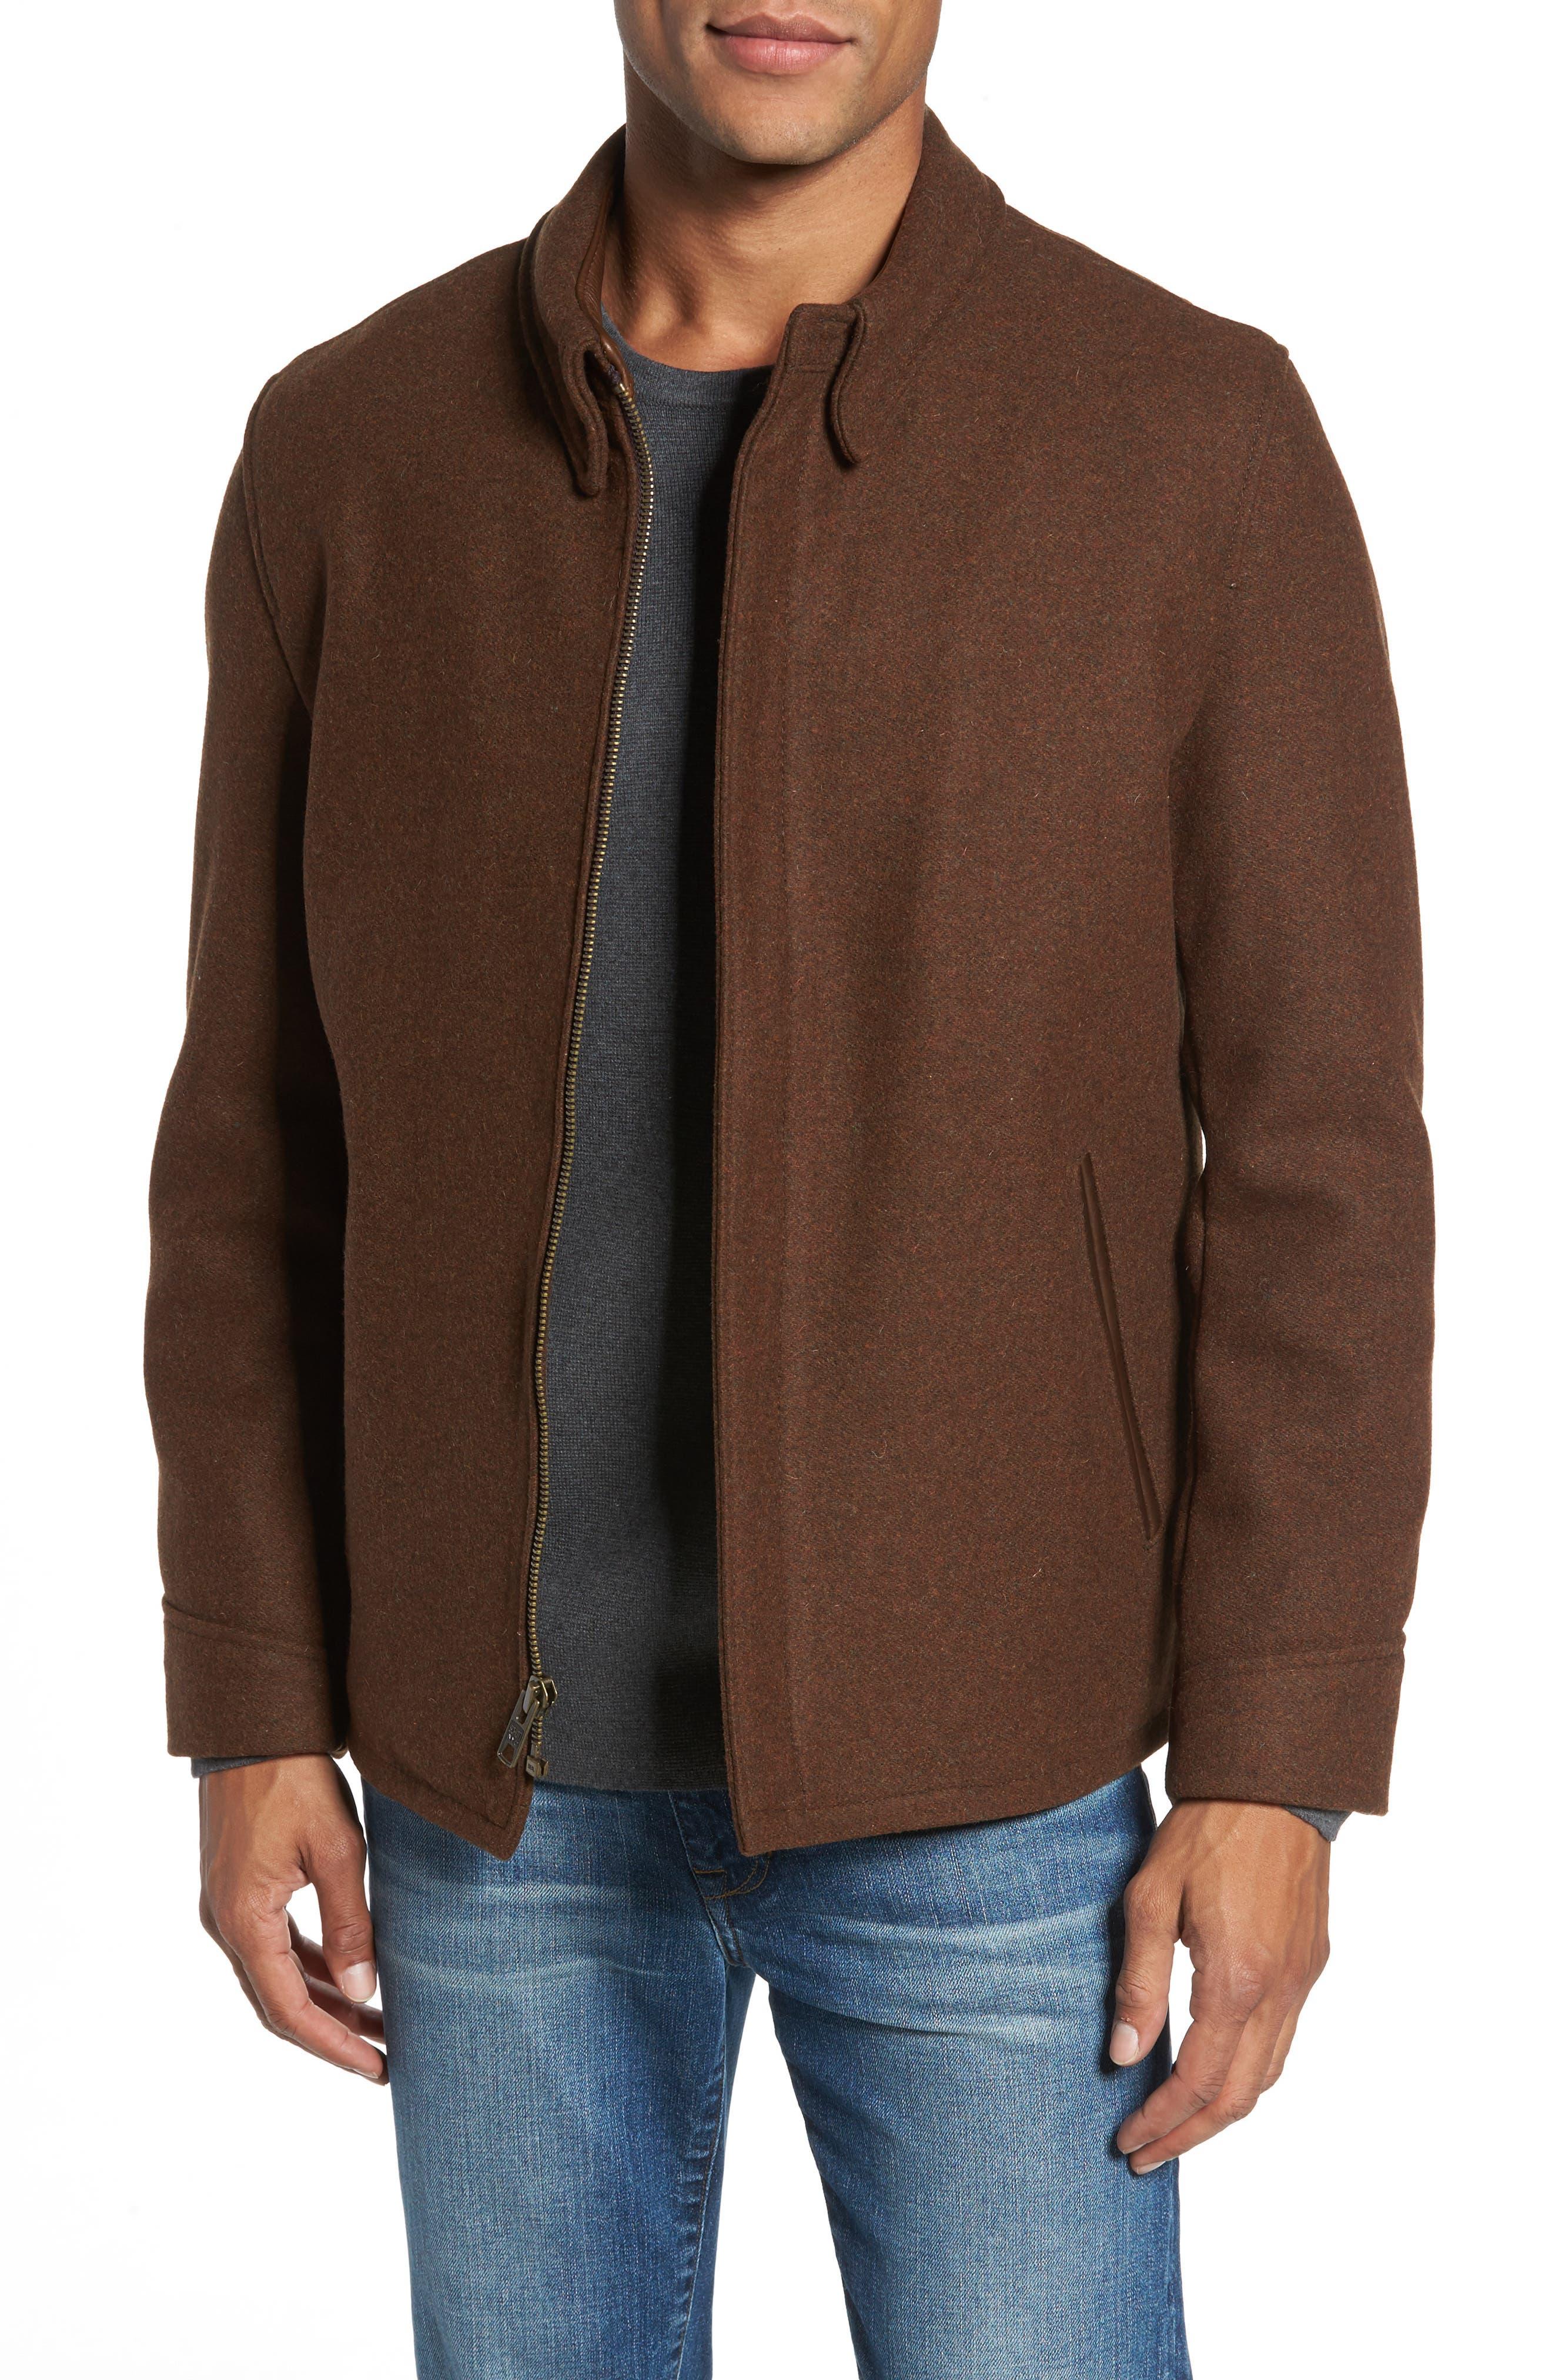 Liberty Wool Blend Zip Front Jacket,                             Main thumbnail 1, color,                             200